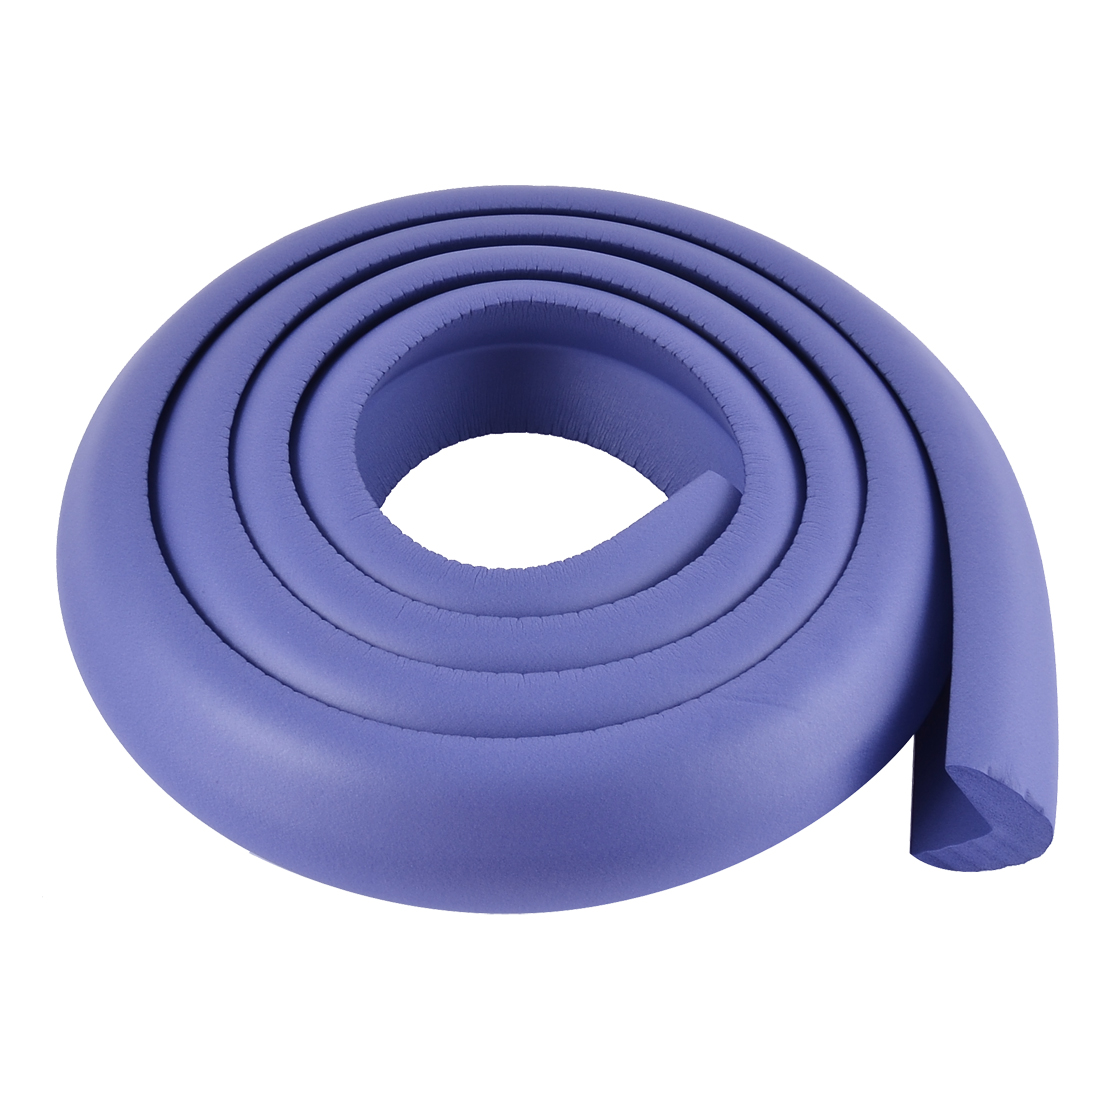 Table Corner Edge Safety Protection Cushion Guard 2M Long Dark Blue